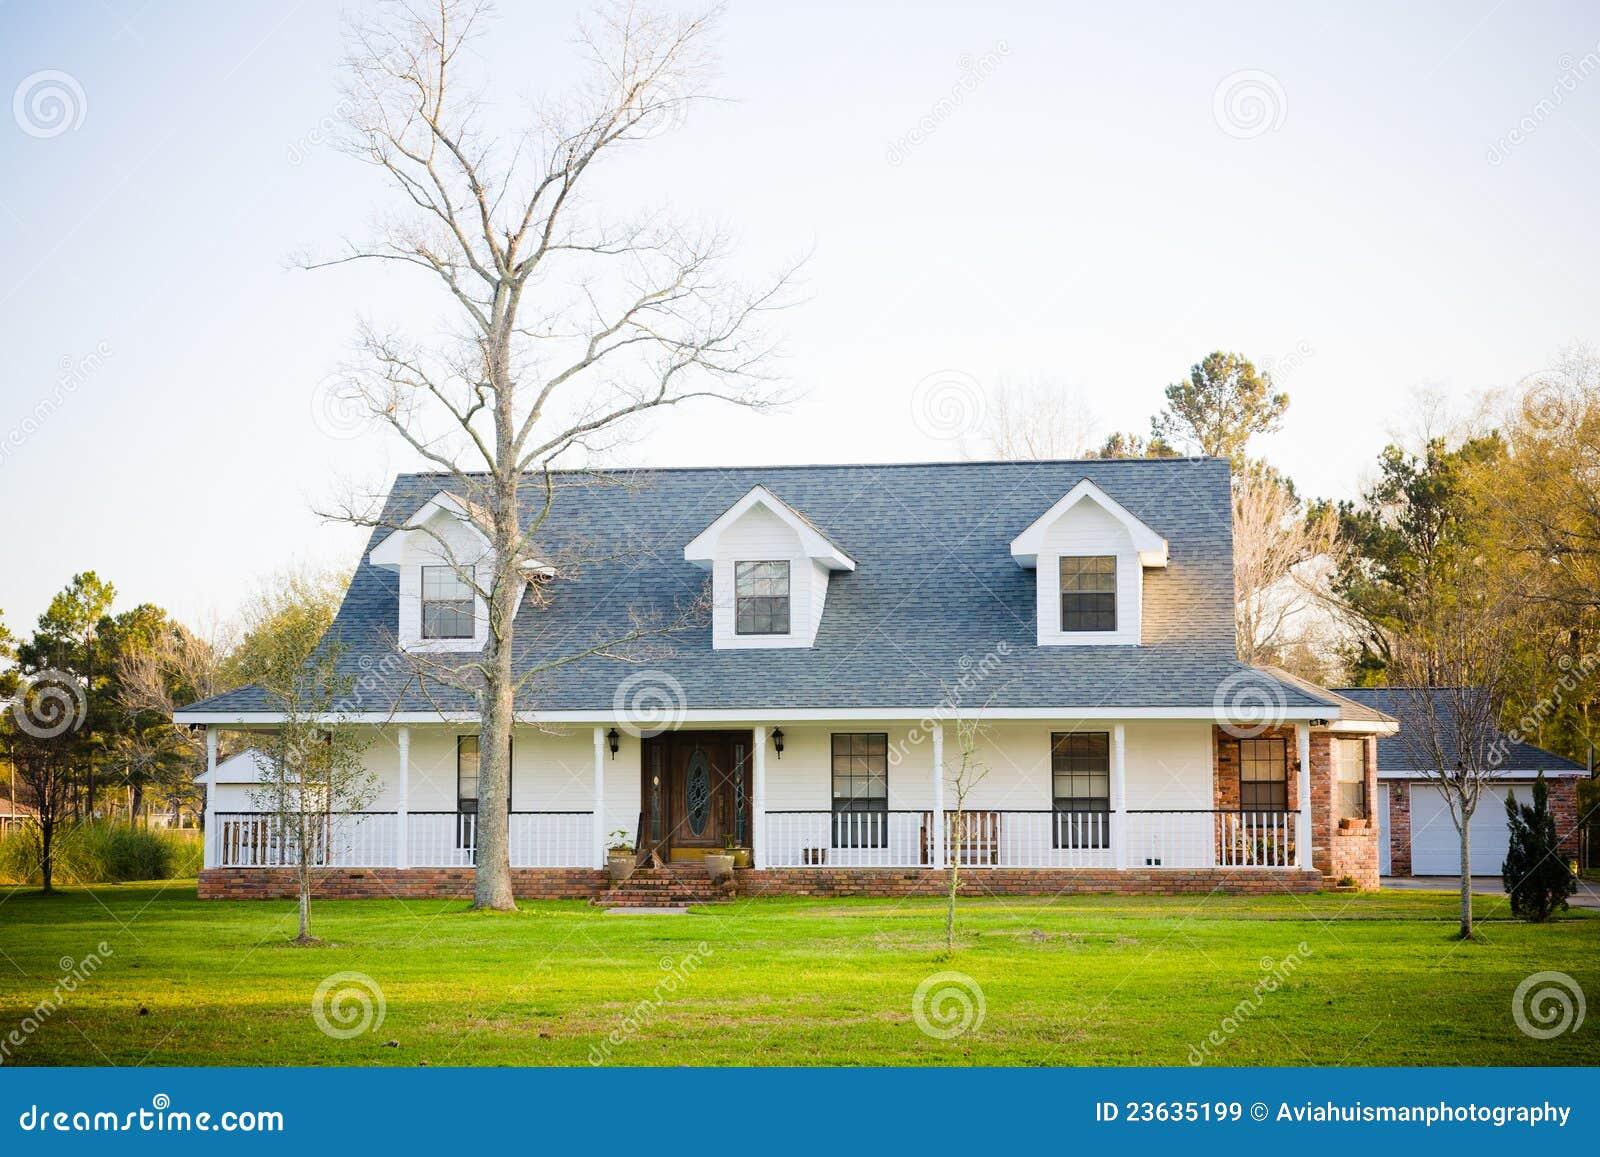 Home branca do americano do estilo do rancho imagens de stock royalty free imagem 23635199 - American home decor property ...